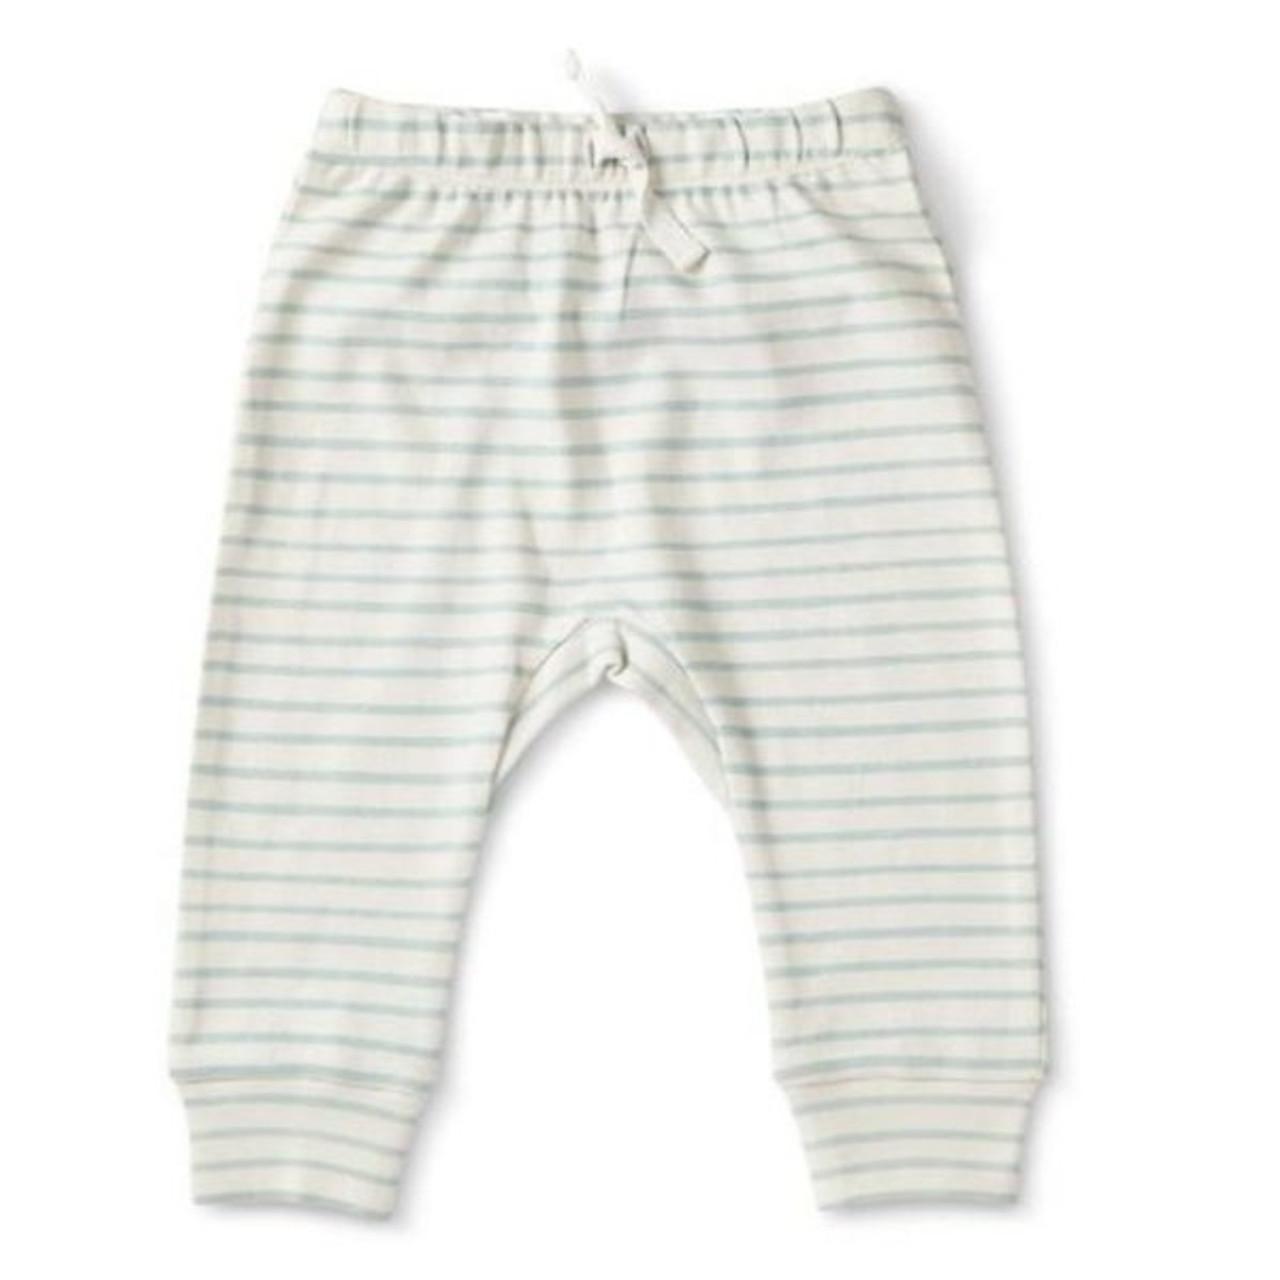 Organic Baby Harem Pants - Grey Stripe, 0-3m